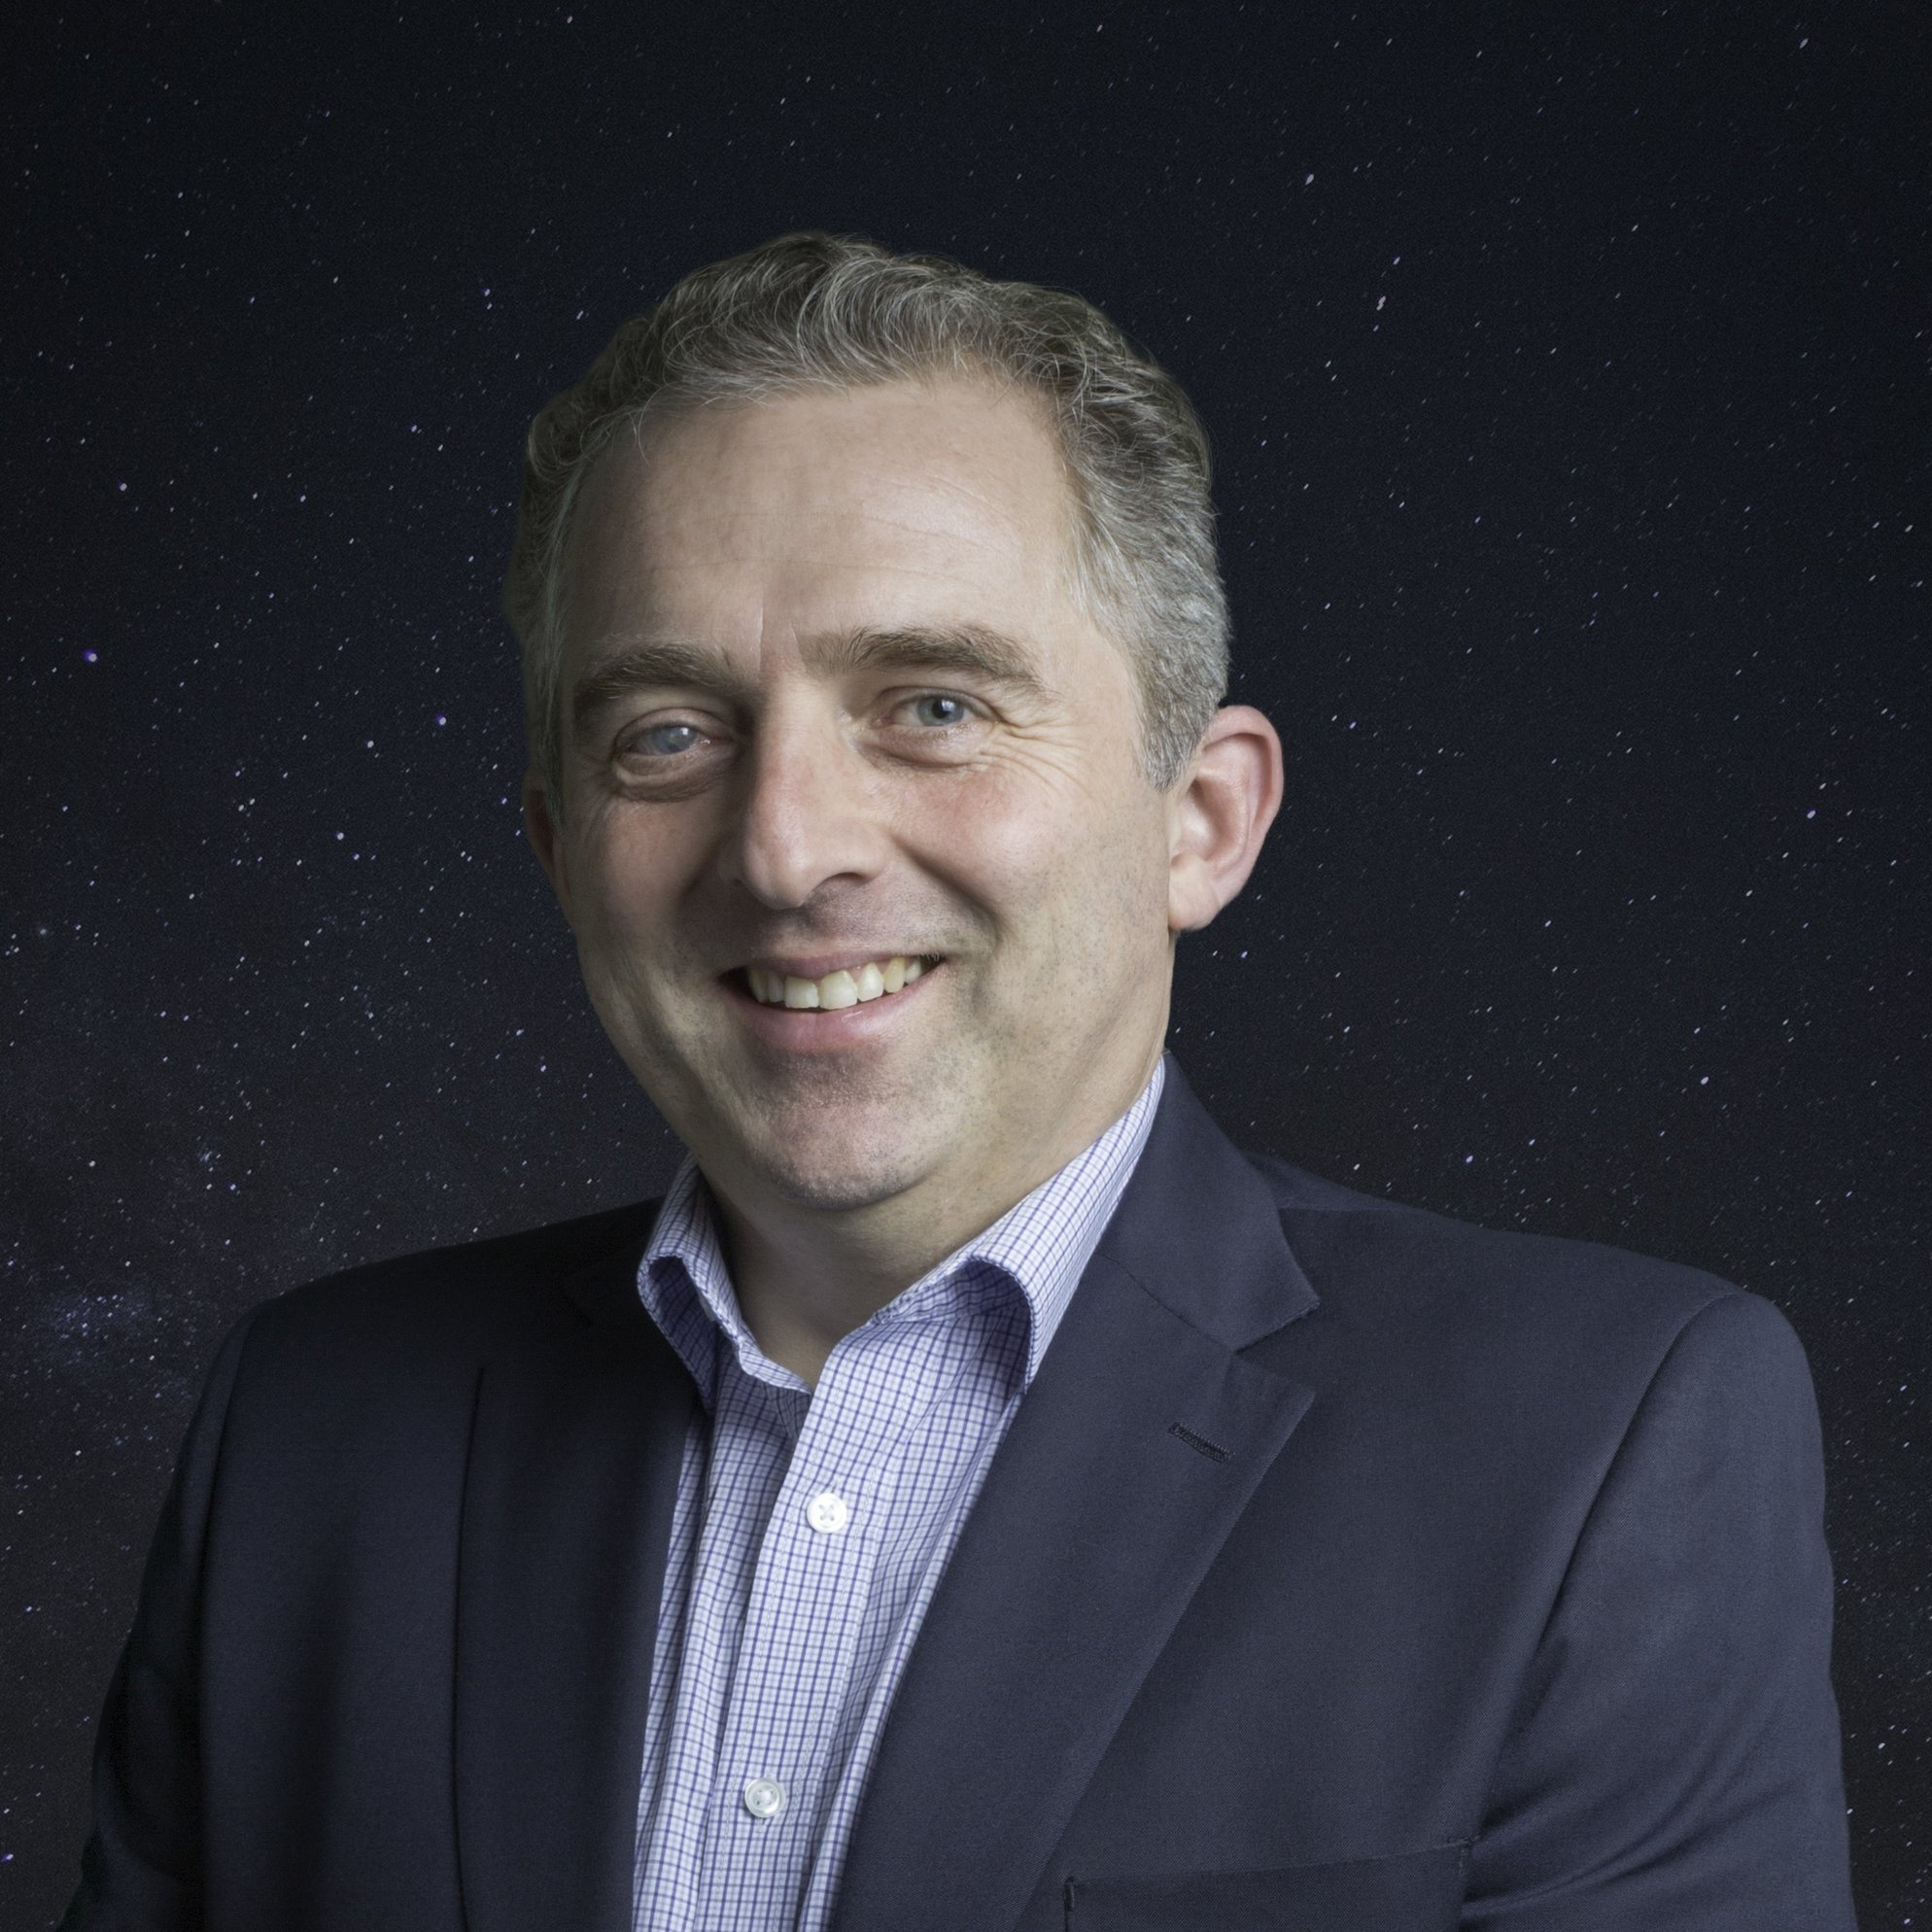 Miles Carden - Director, Spaceport Cornwall